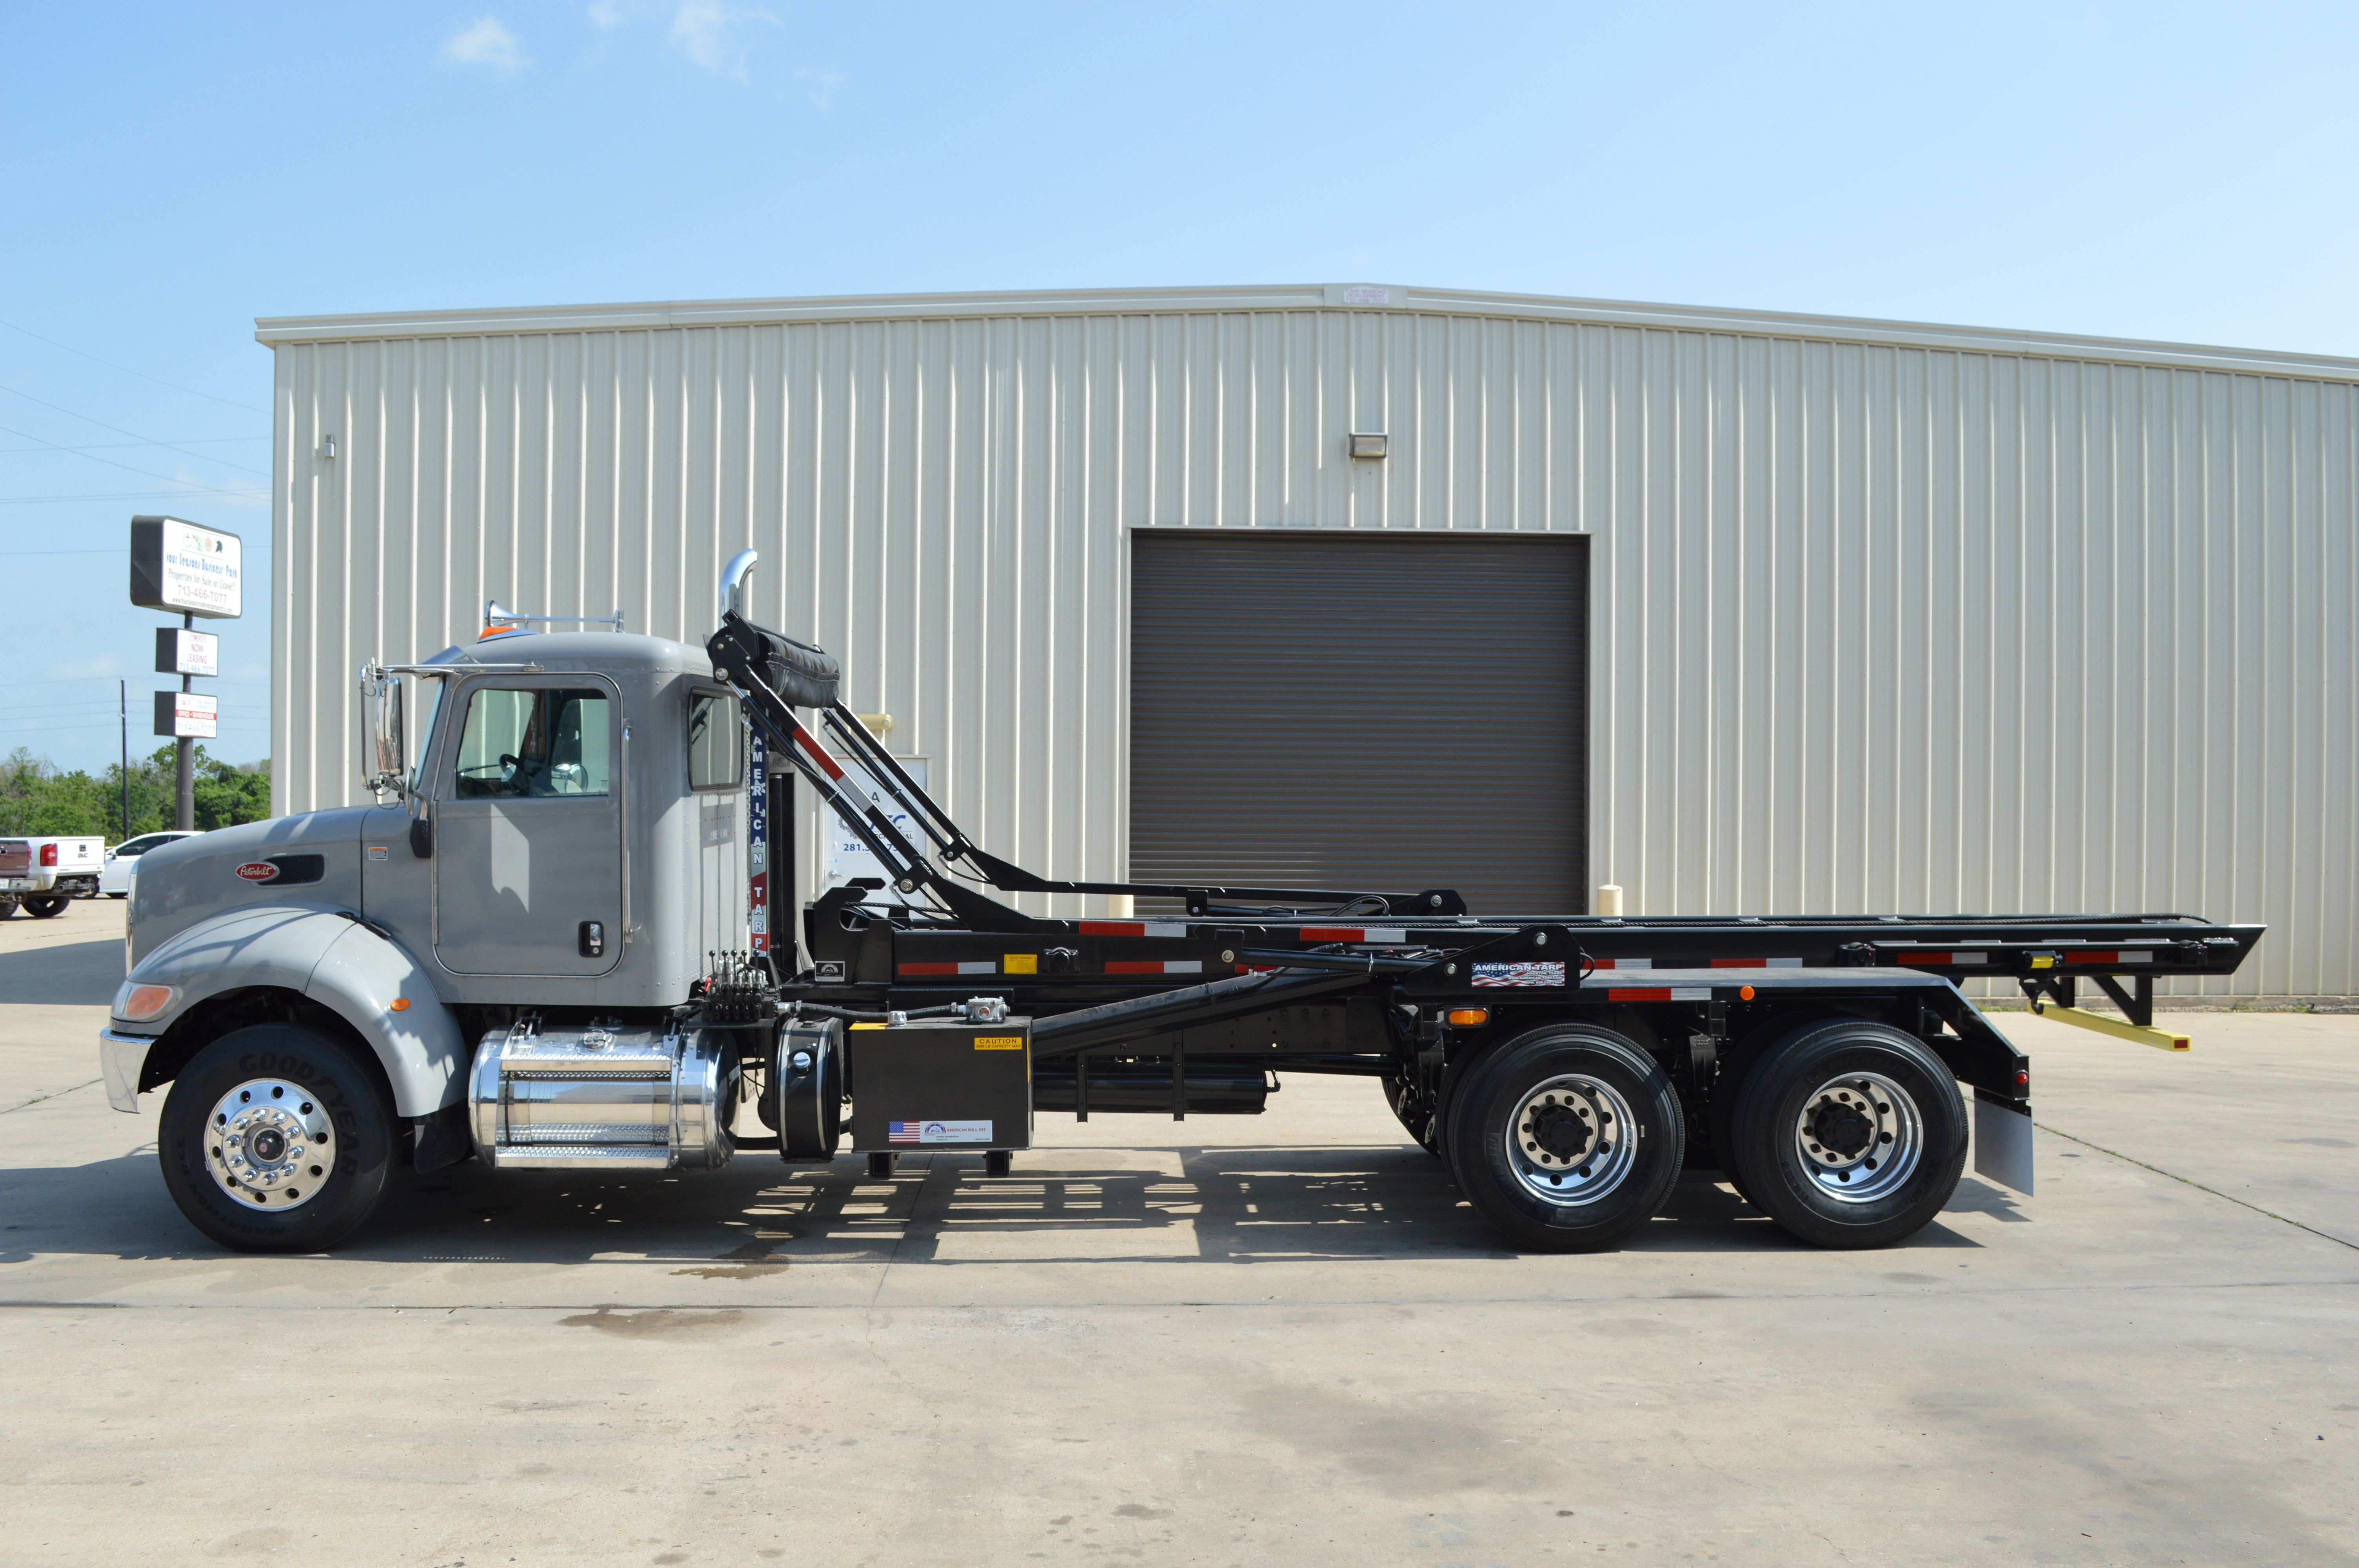 Used, 2016, Peterbilt, 348 Roll off Trucks (SEVERAL AVAILABLE), Transfer Trucks